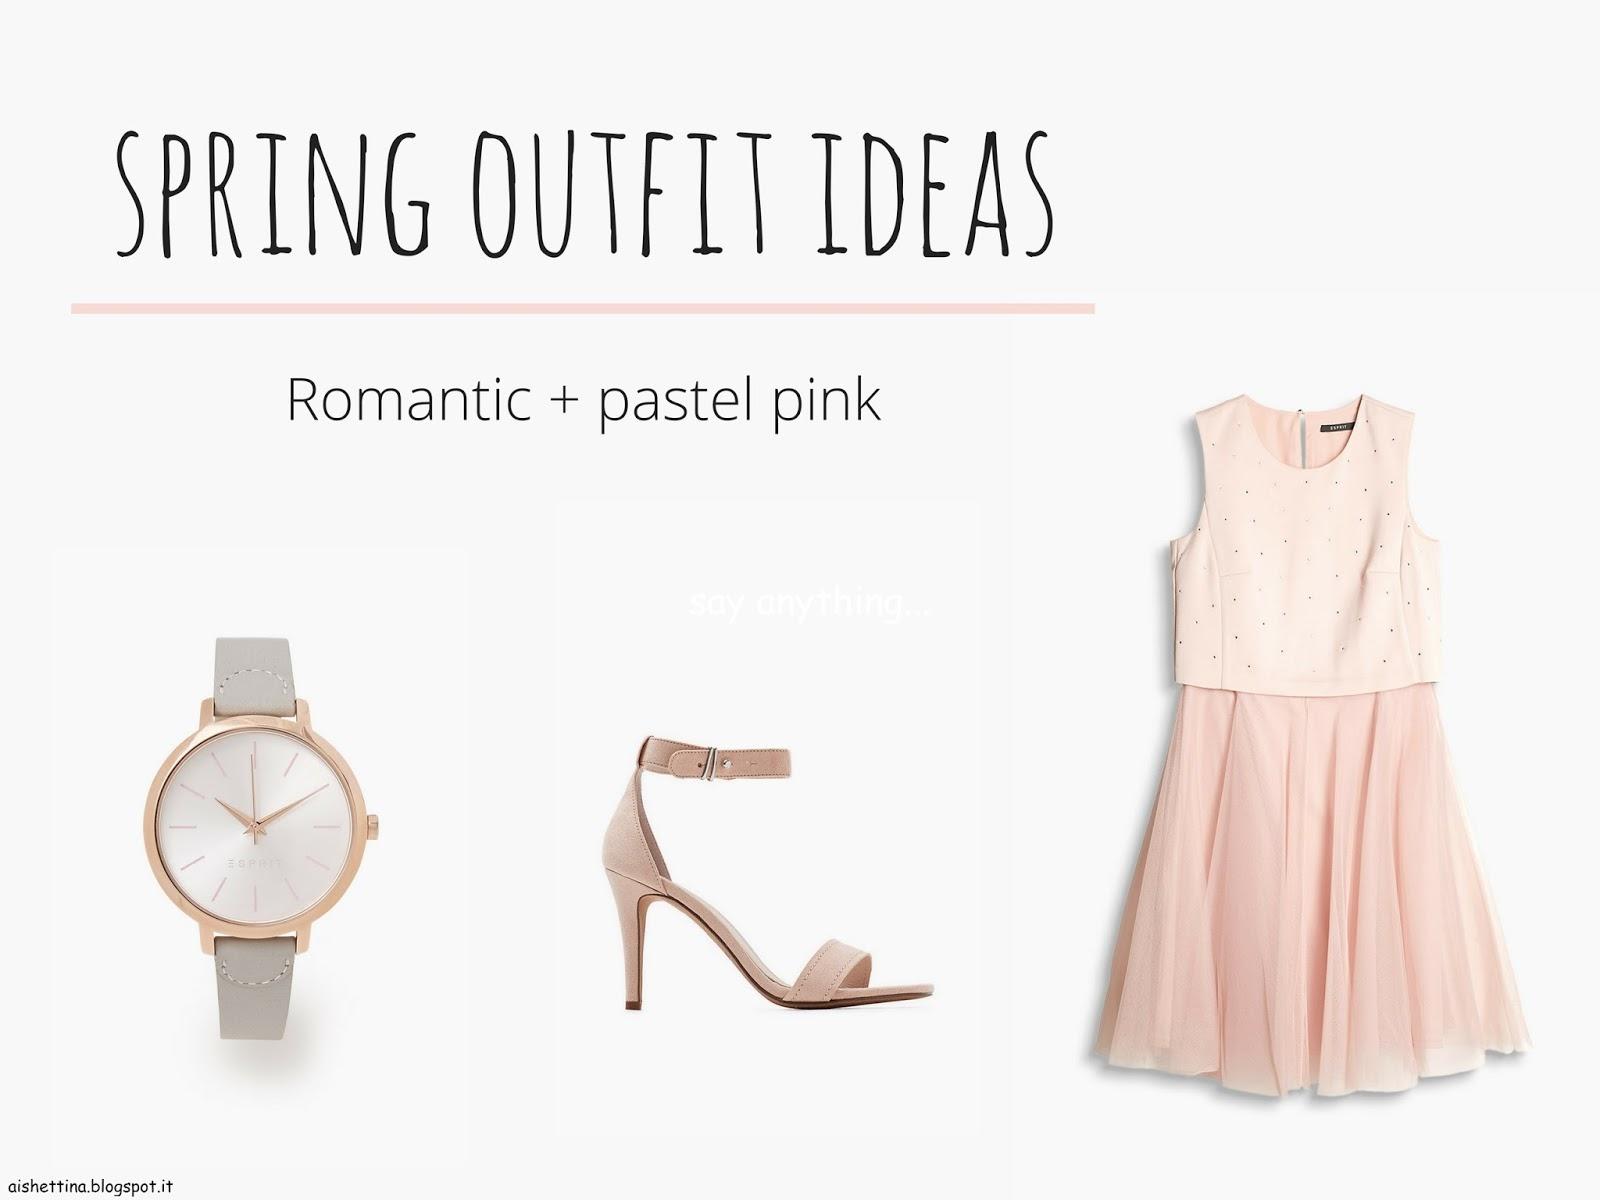 romantic + pastel pink